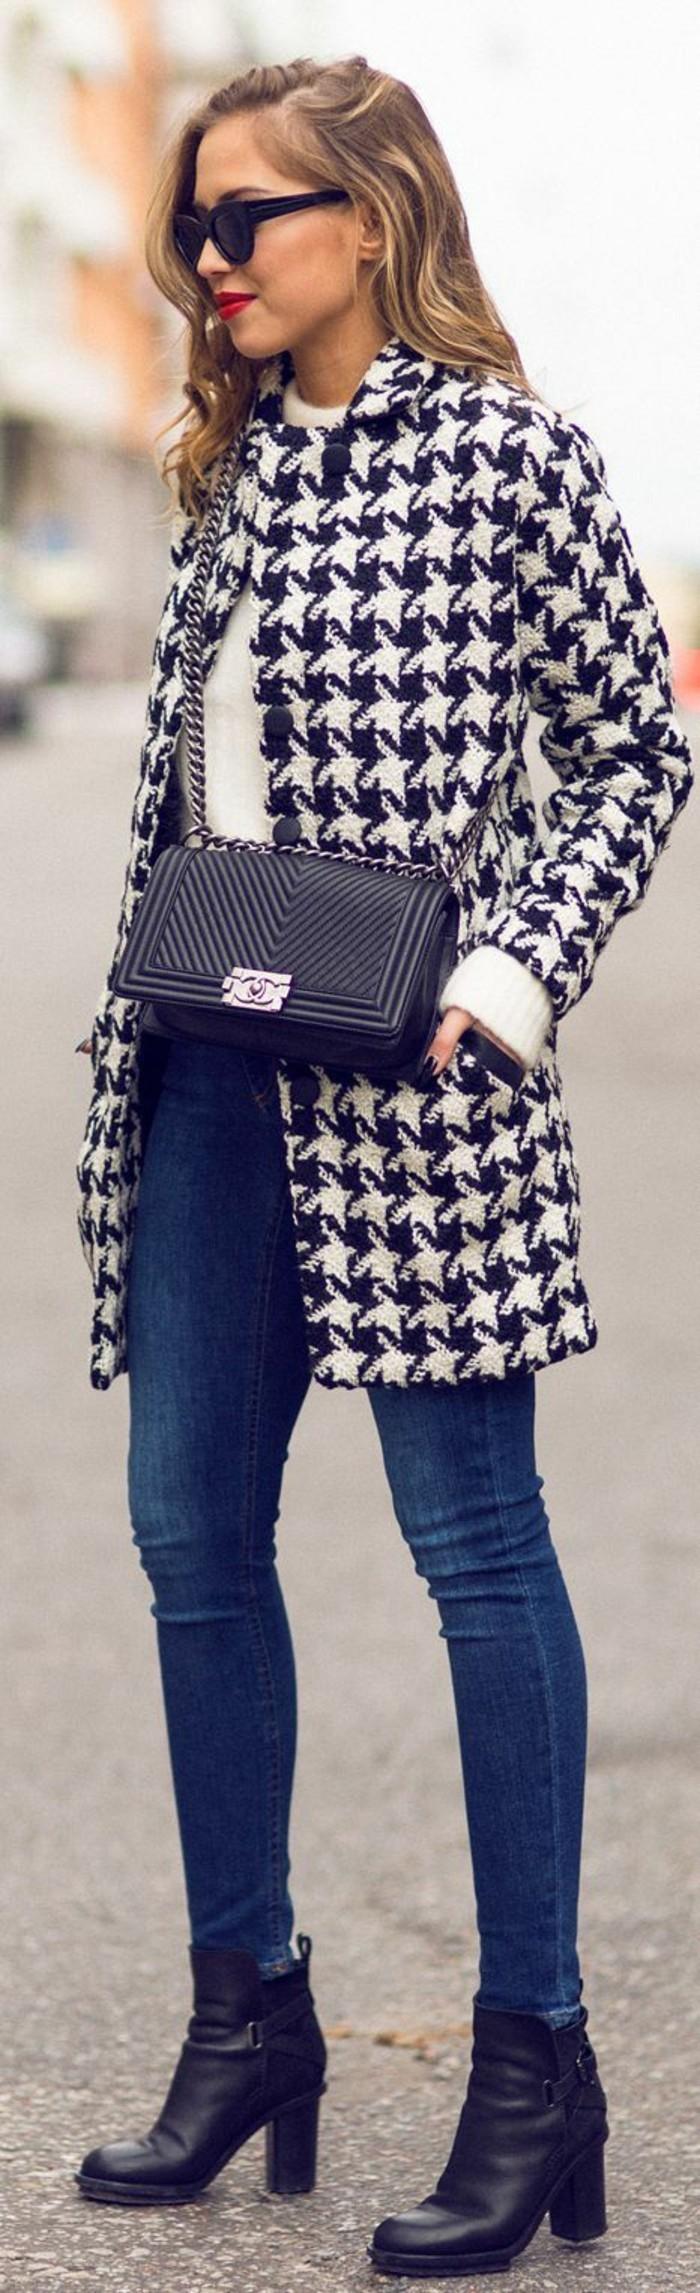 manteau-droit-femme-tenue-elegante-jean-slim-et-bottines-en-cuir